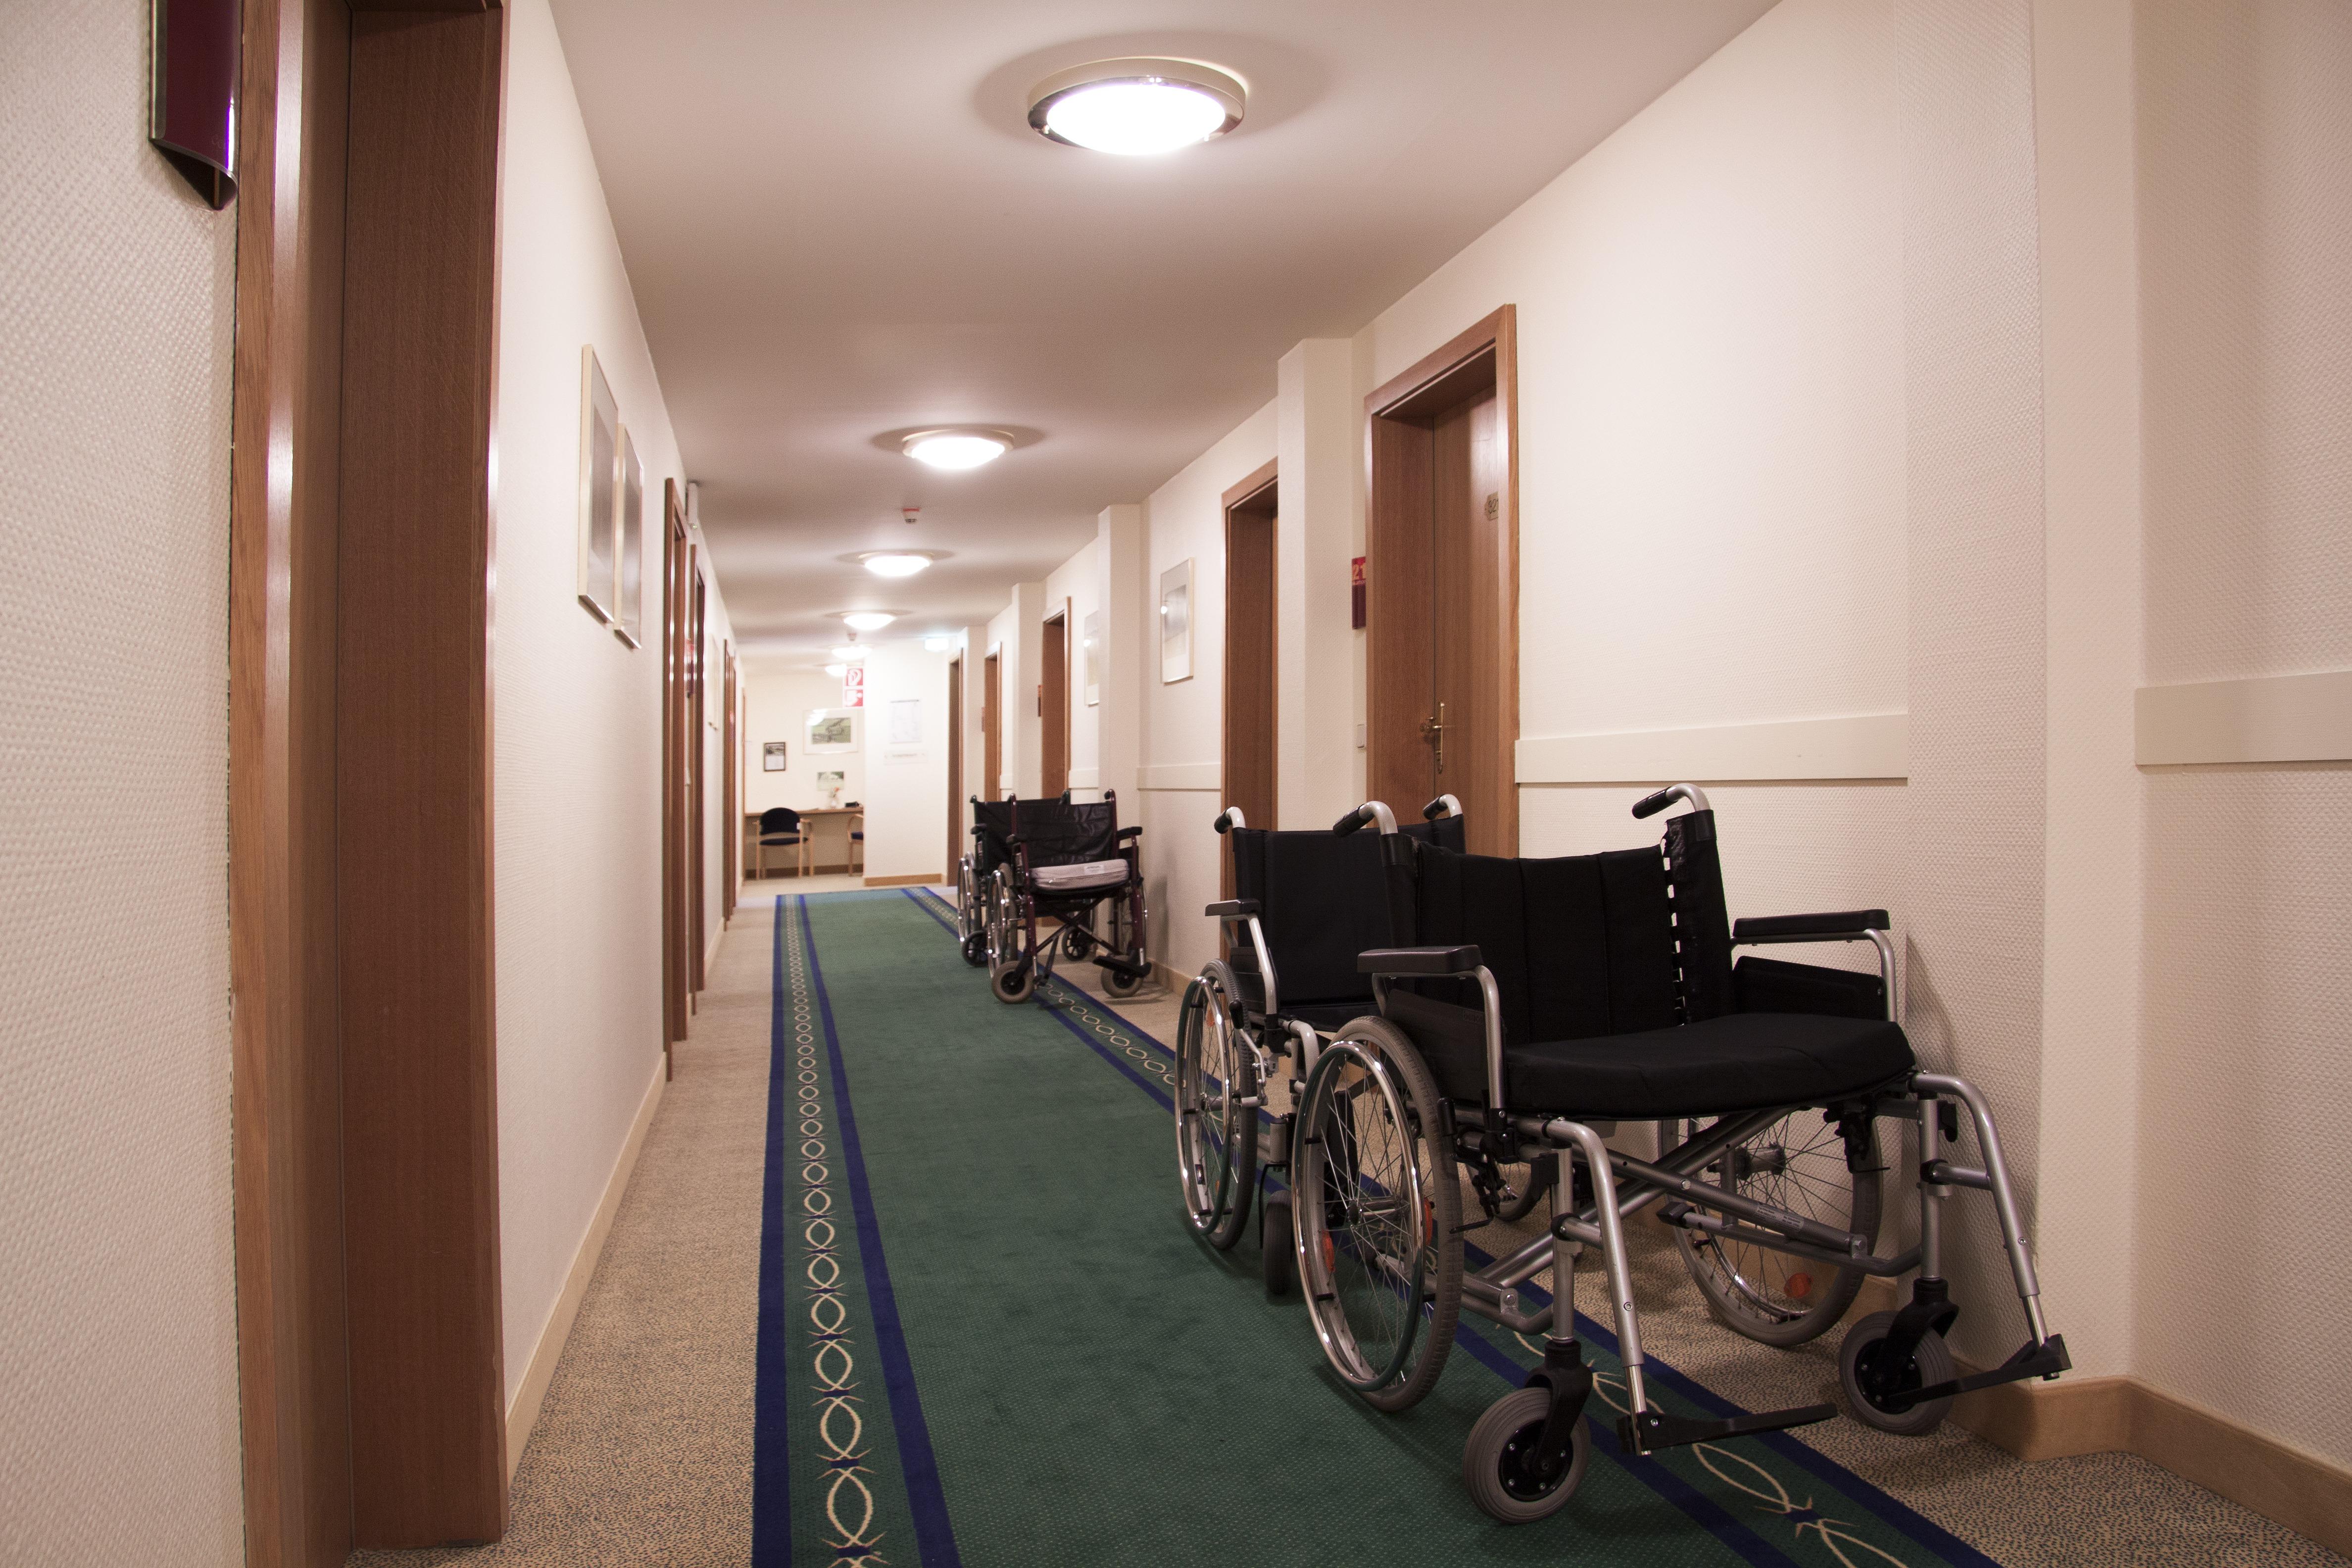 Free Images Floor Building Property Apartment Interior Design Wheelchair Rehabilitation Waiting Room Tools Hospital Estate Suite Gang